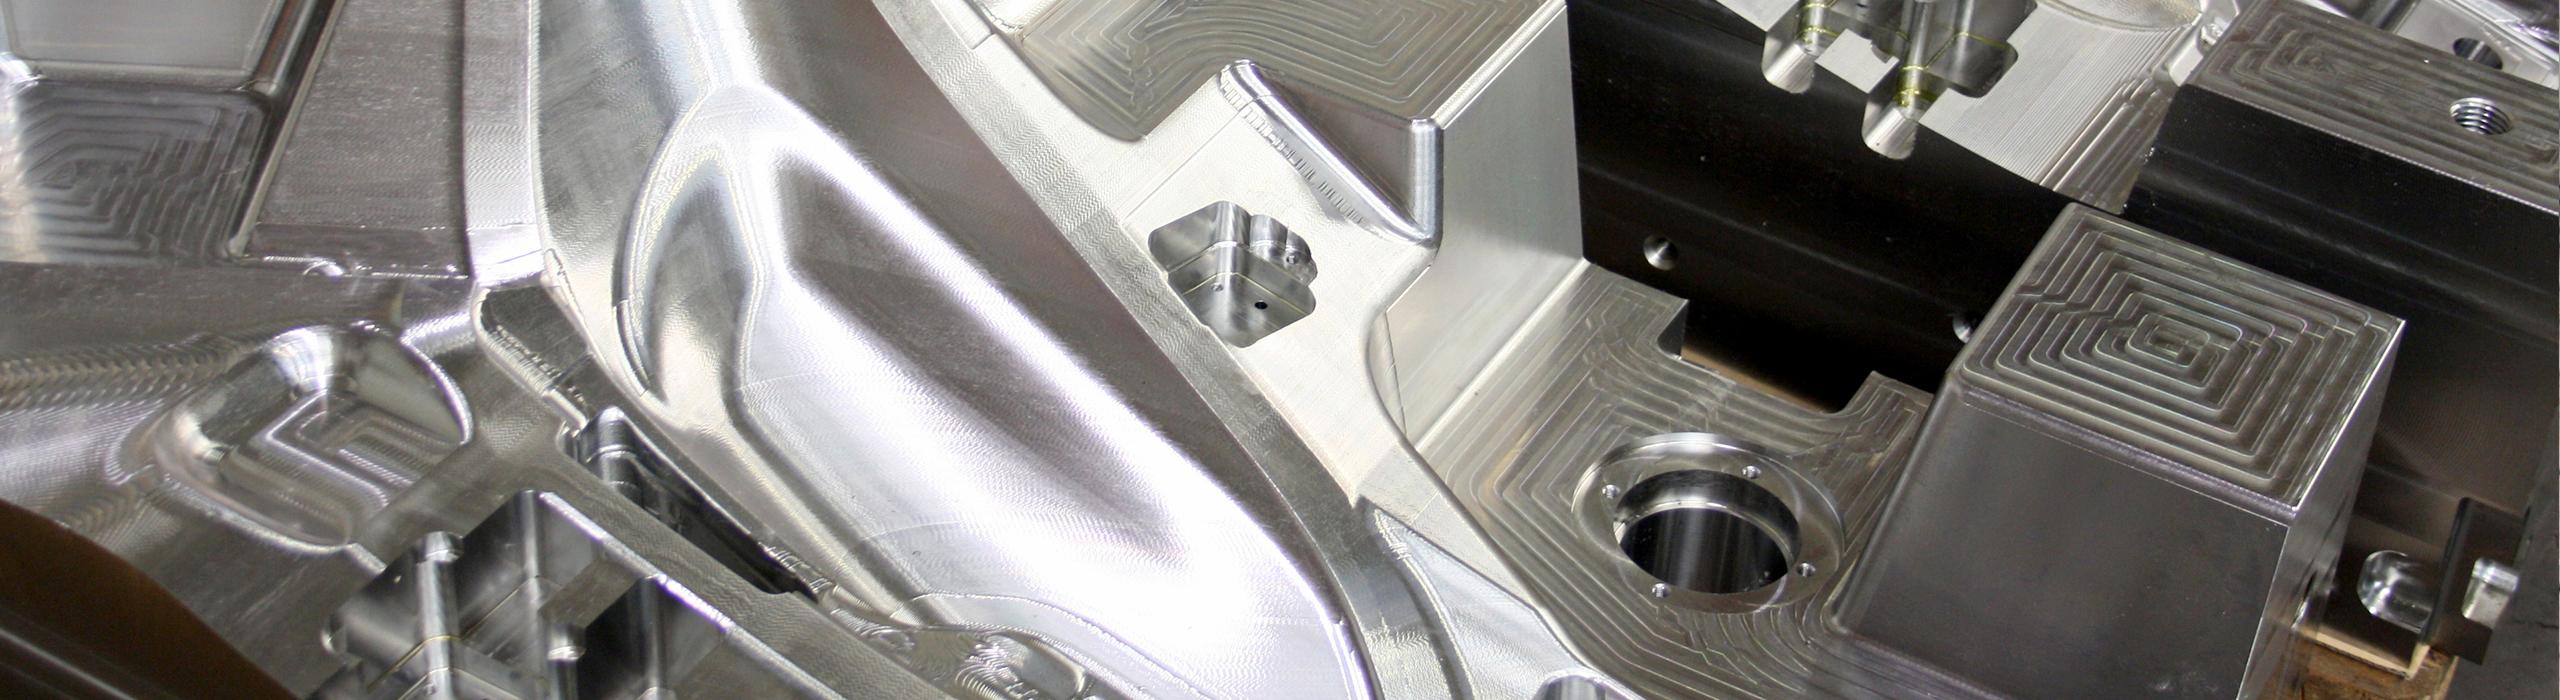 RSB-Stahl-foemenbau-header3